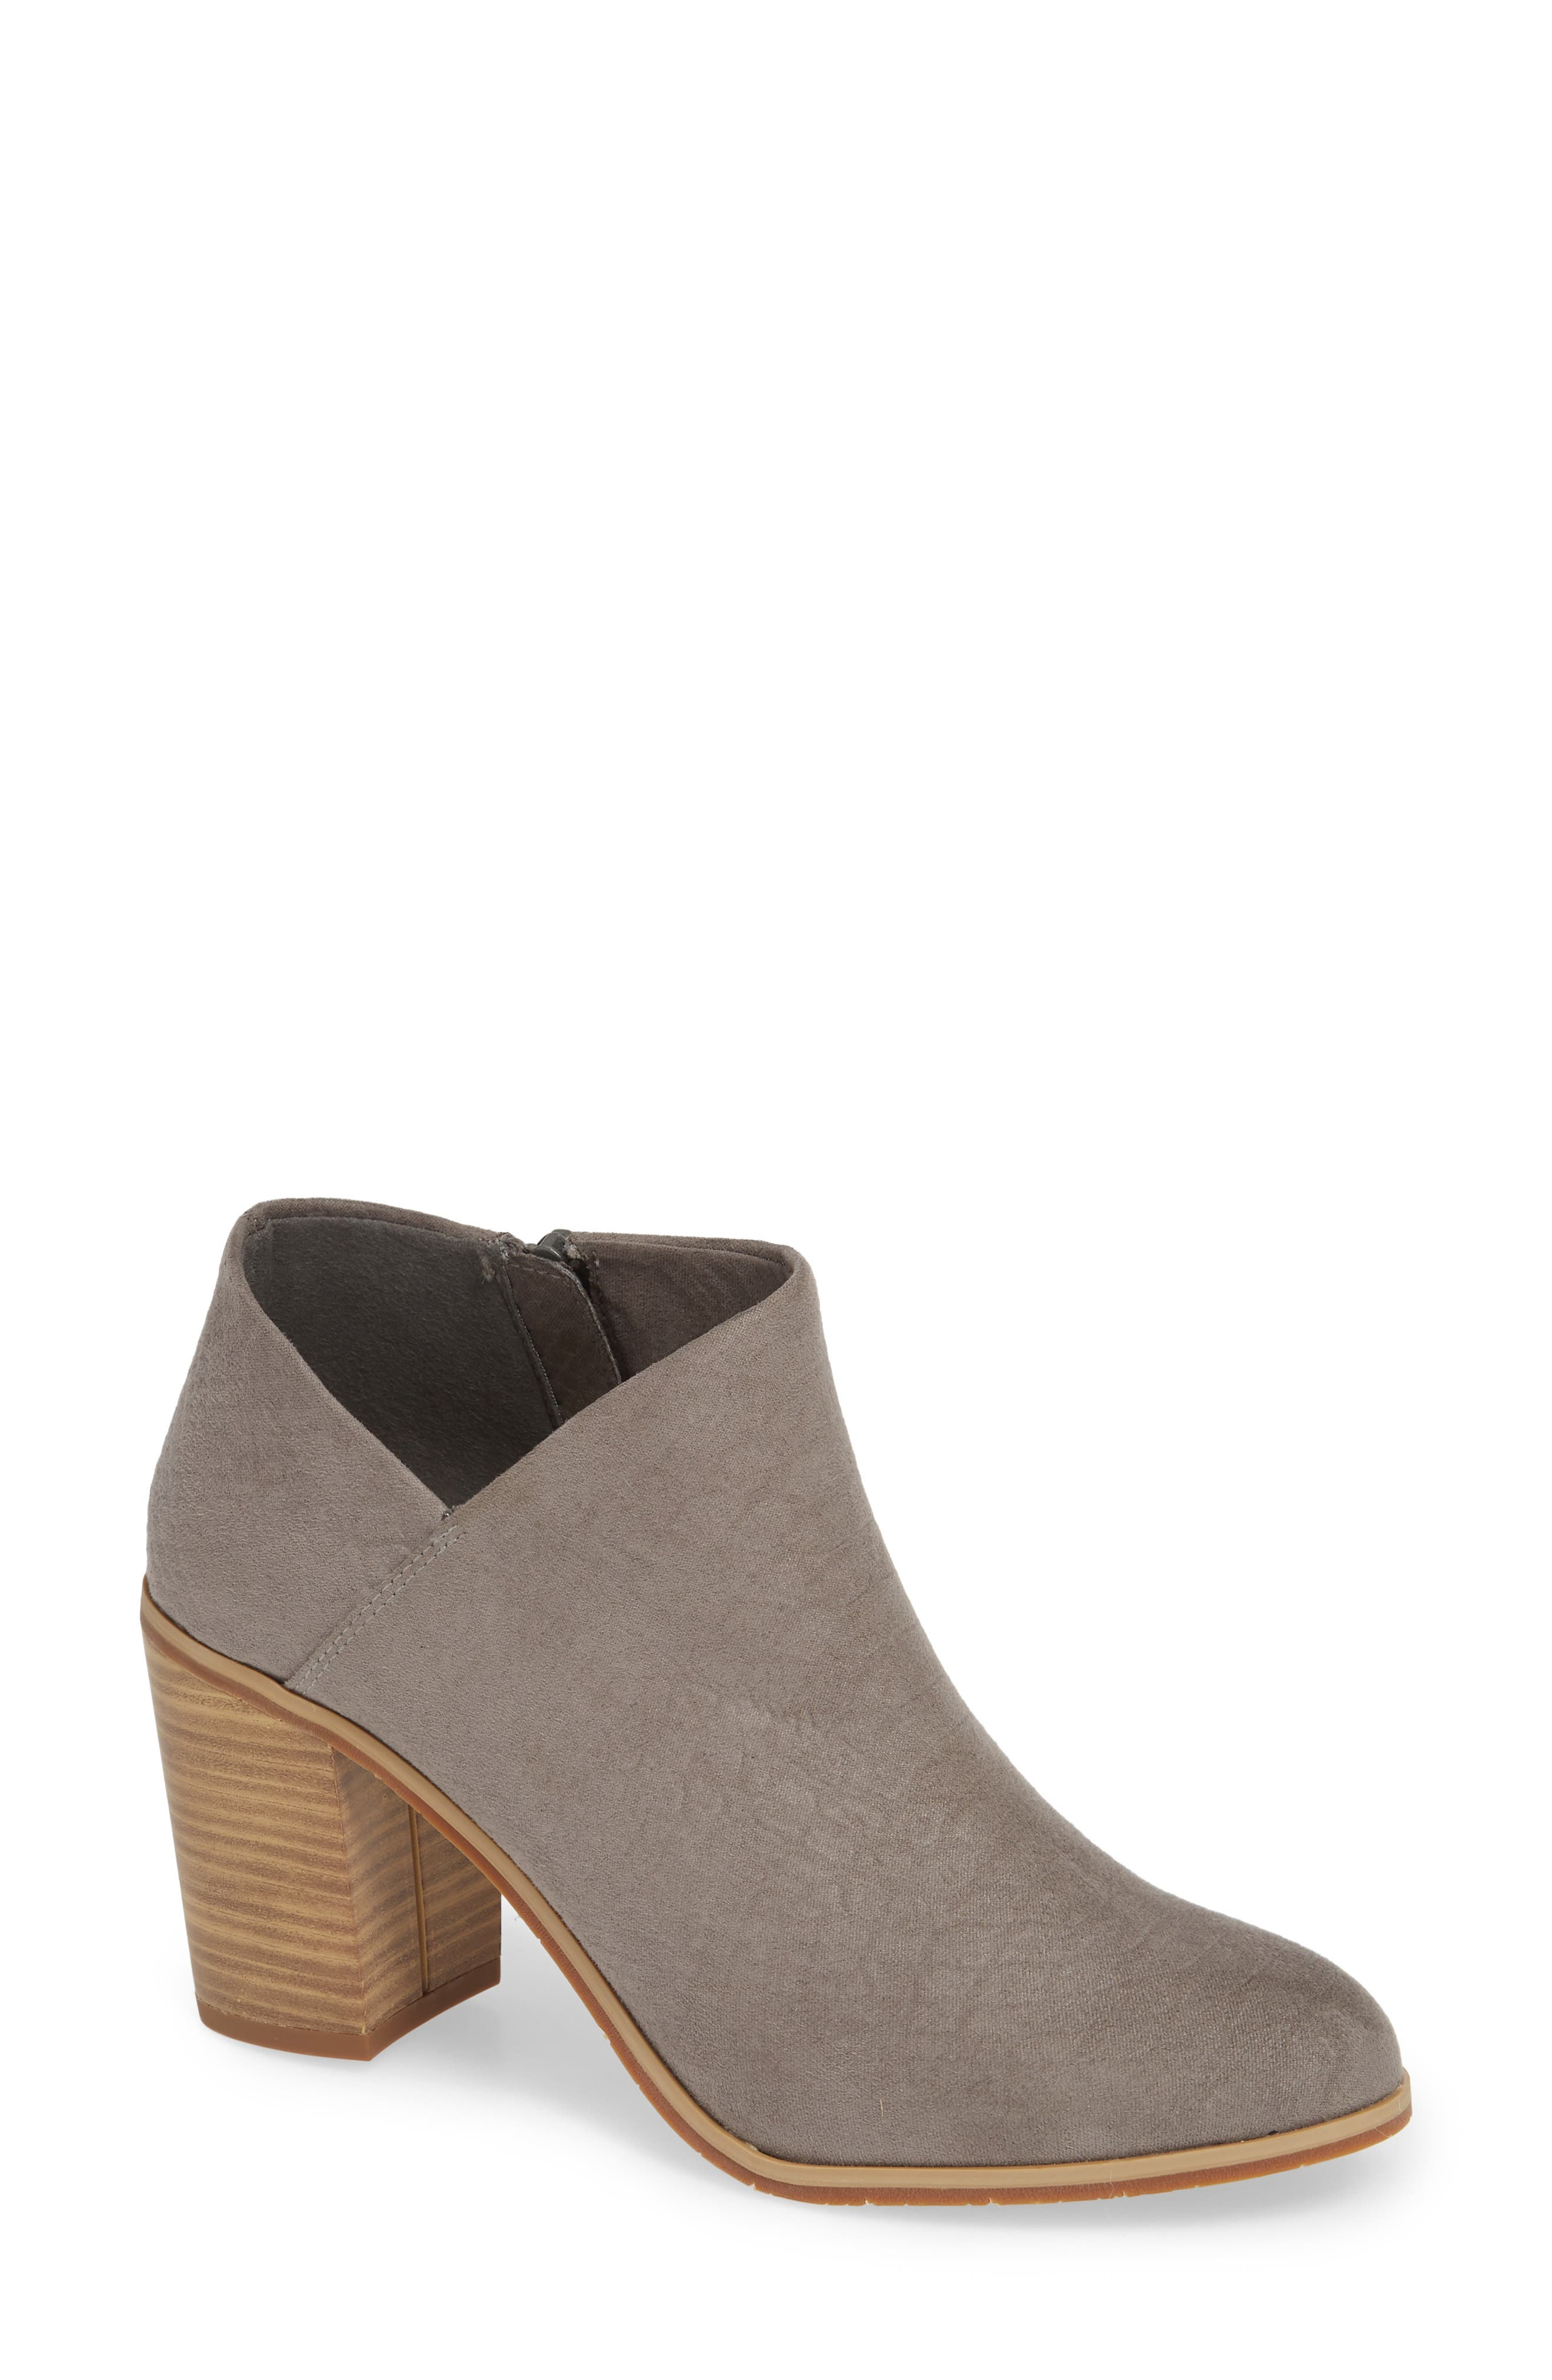 BC FOOTWEAR,                             Kettle Block Heel Bootie,                             Main thumbnail 1, color,                             GREY VEGAN SUEDE